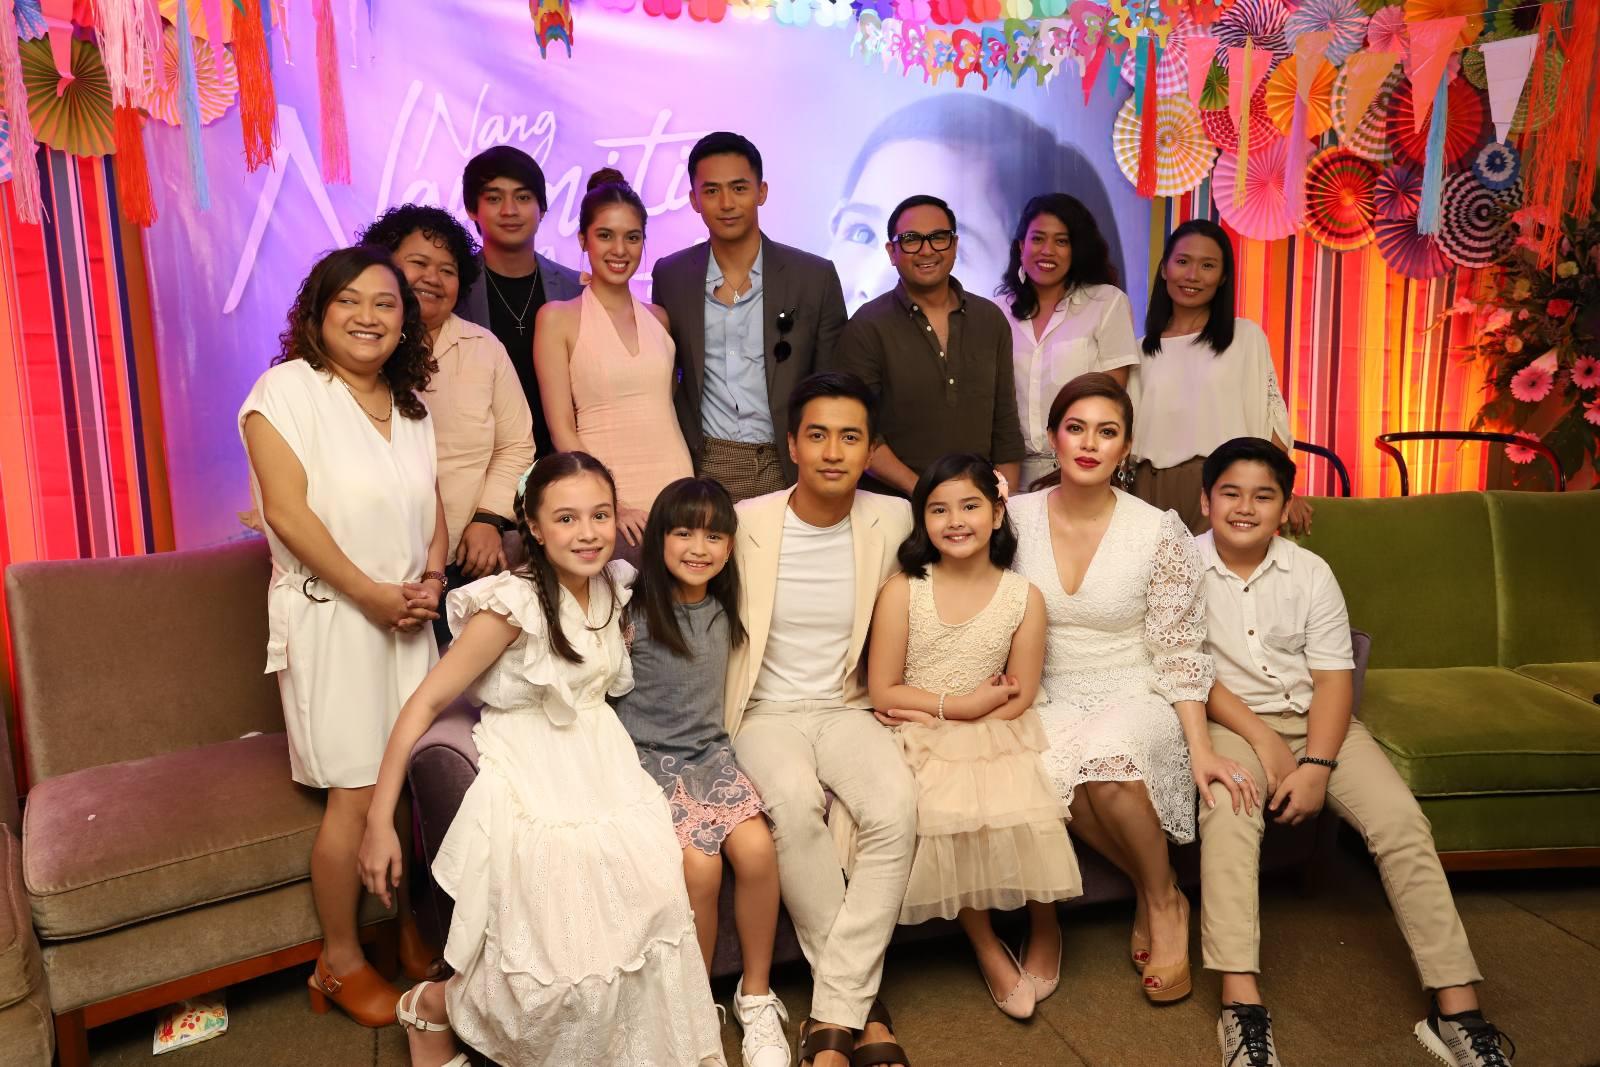 The lead cast of 'Nang Ngumiti ang Langit'